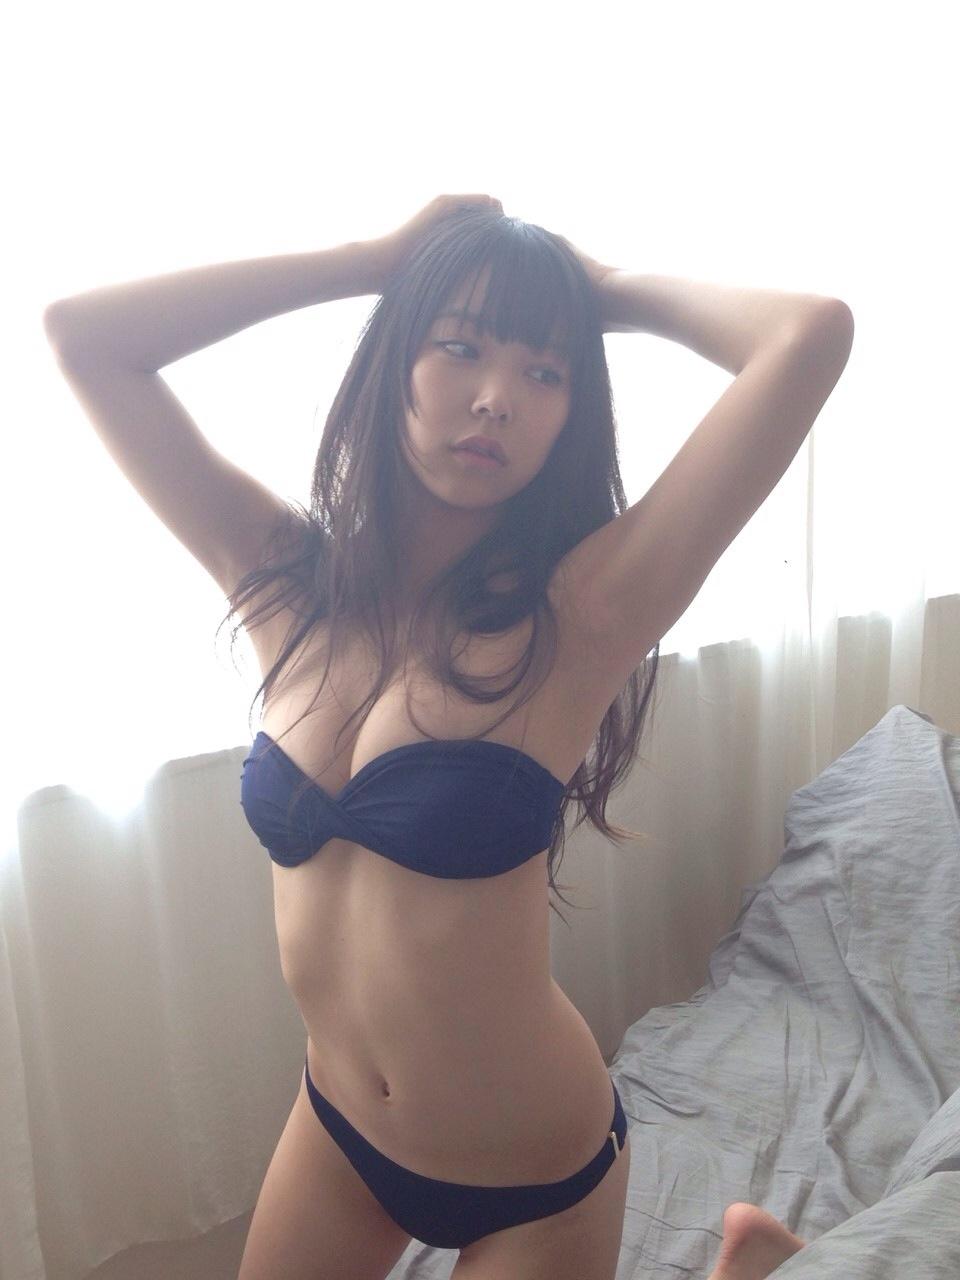 AKBグループ専用のワキ・脇・腋フェチスレfc2>1本 YouTube動画>2本 ->画像>1535枚